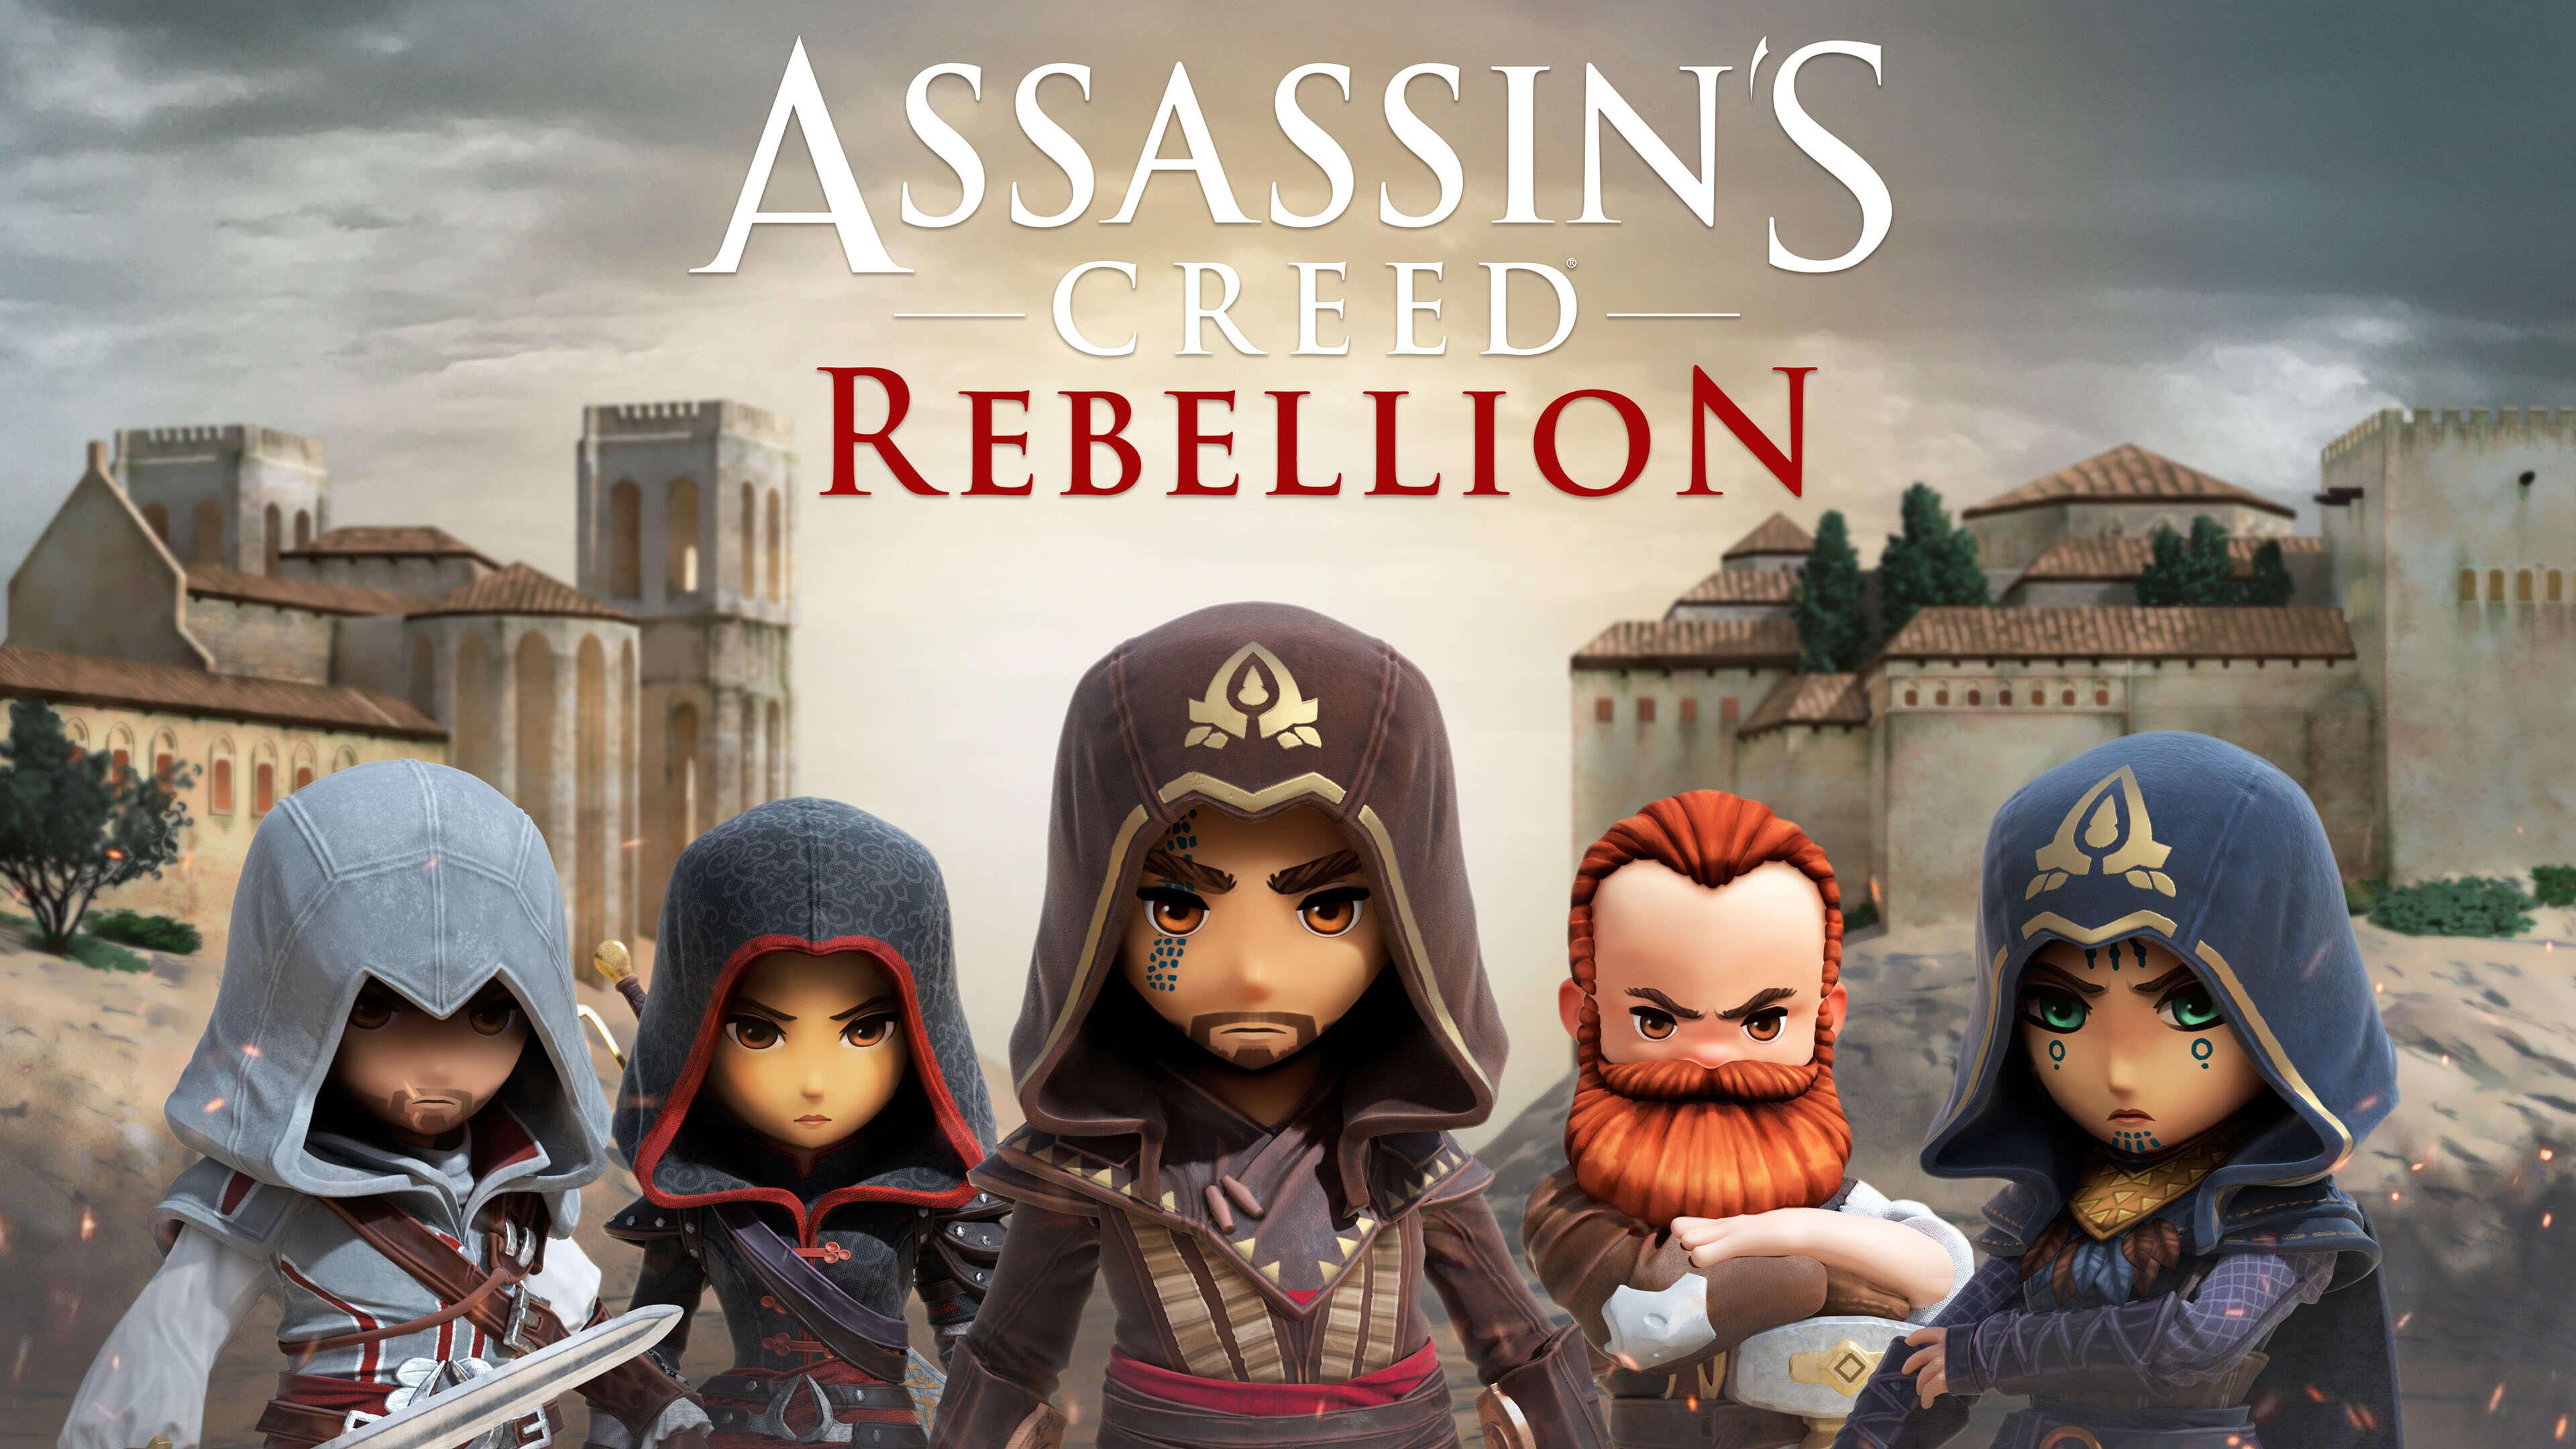 assassins creed rebellion uhd 4k wallpaper